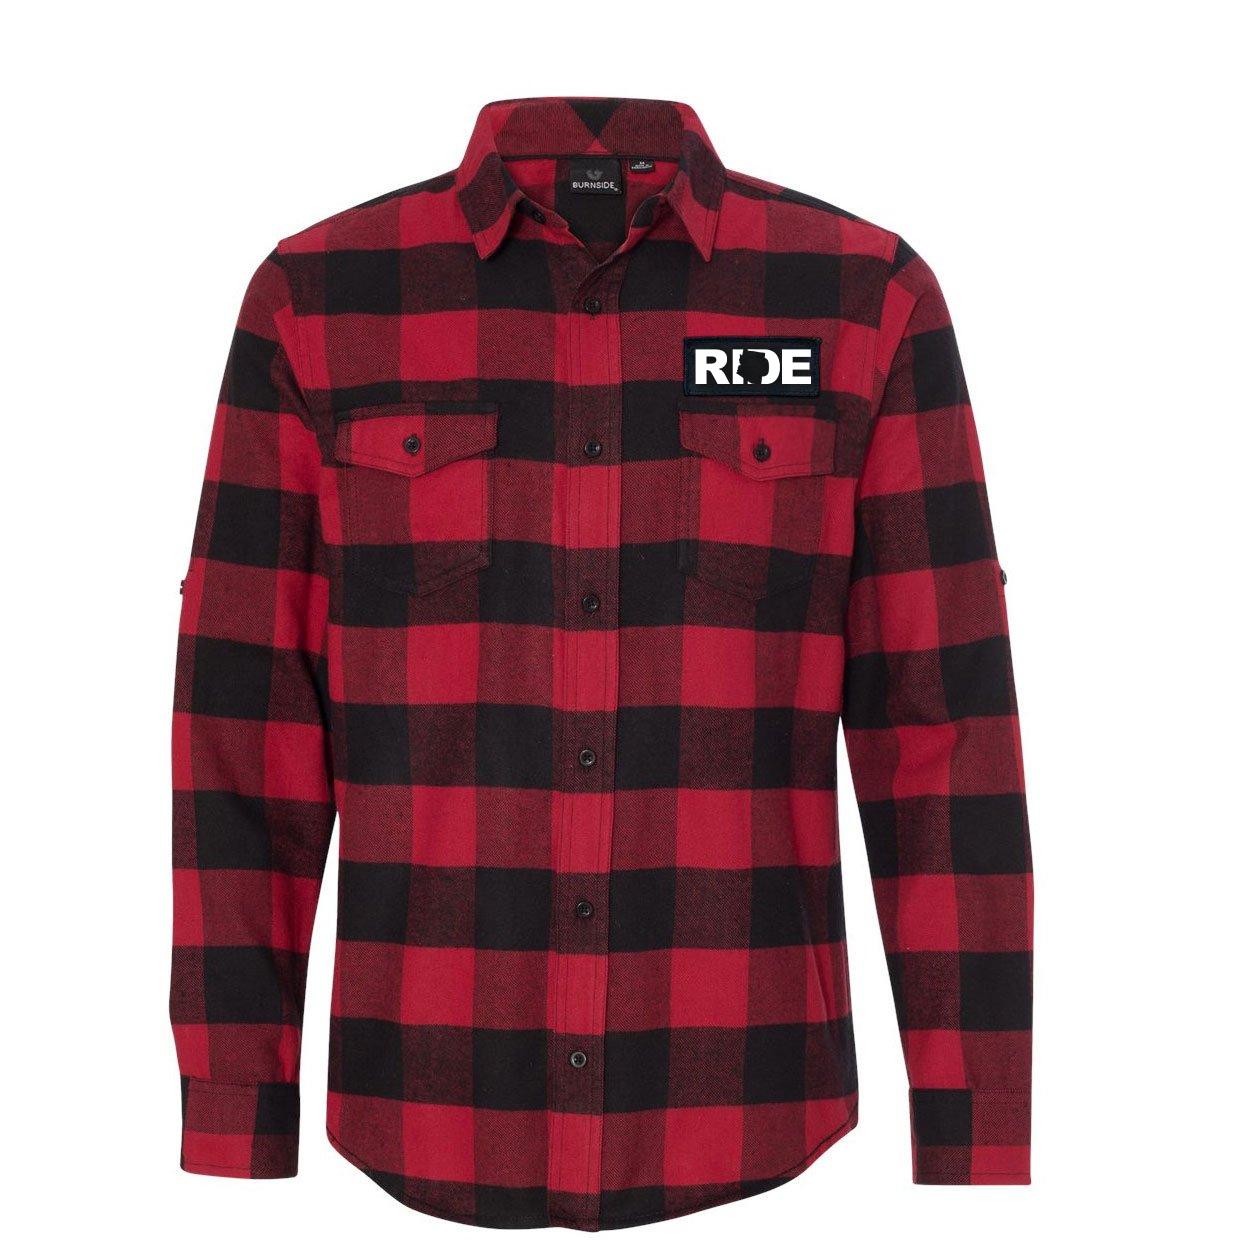 Ride Arizona Classic Unisex Long Sleeve Woven Patch Flannel Shirt Red/Black Buffalo (White Logo)